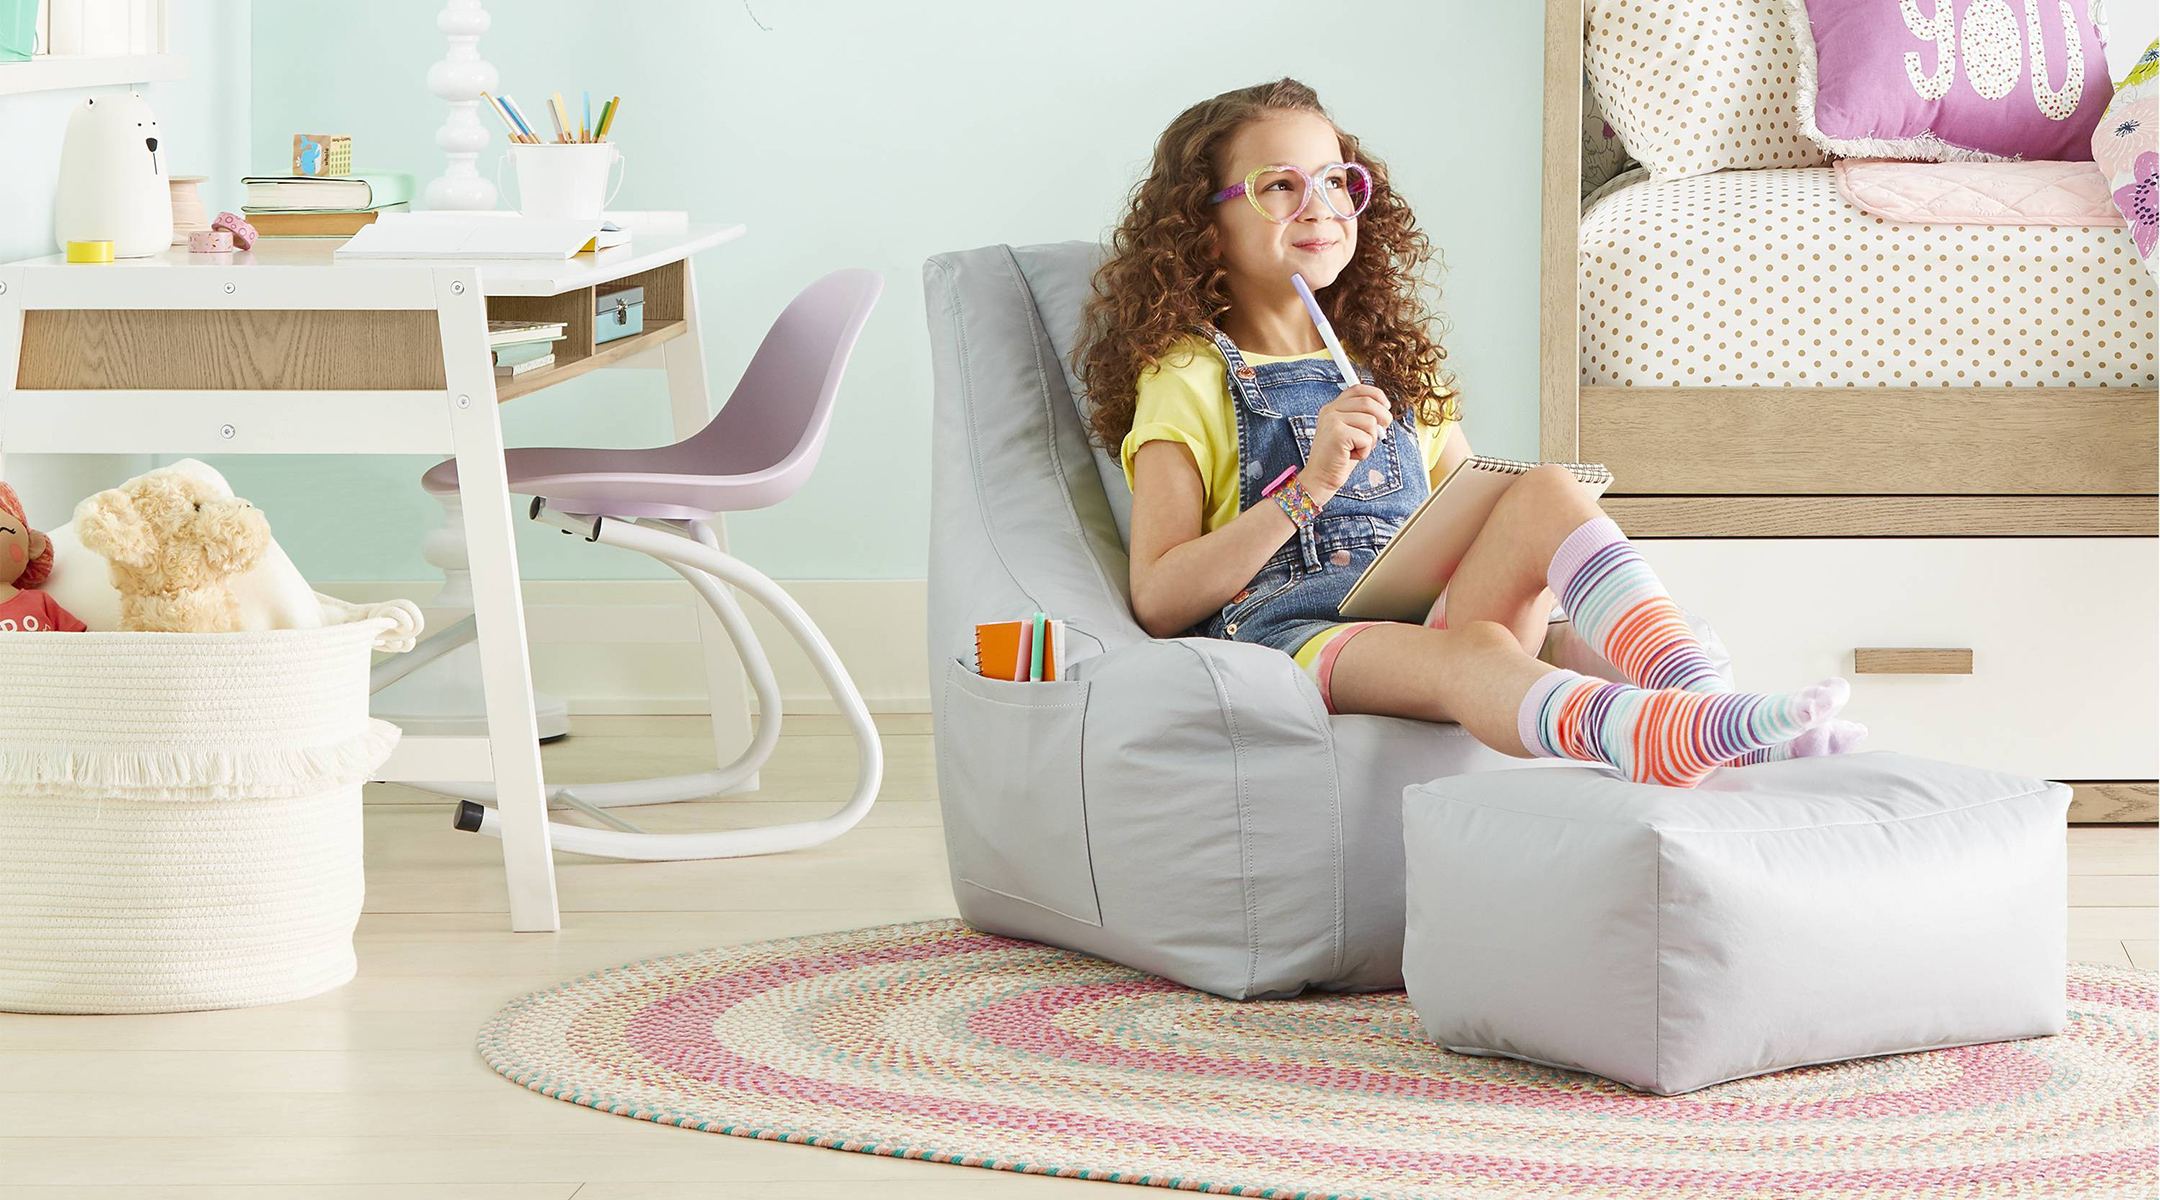 Target Introduces SensoryFriendly Furniture Line for Kids